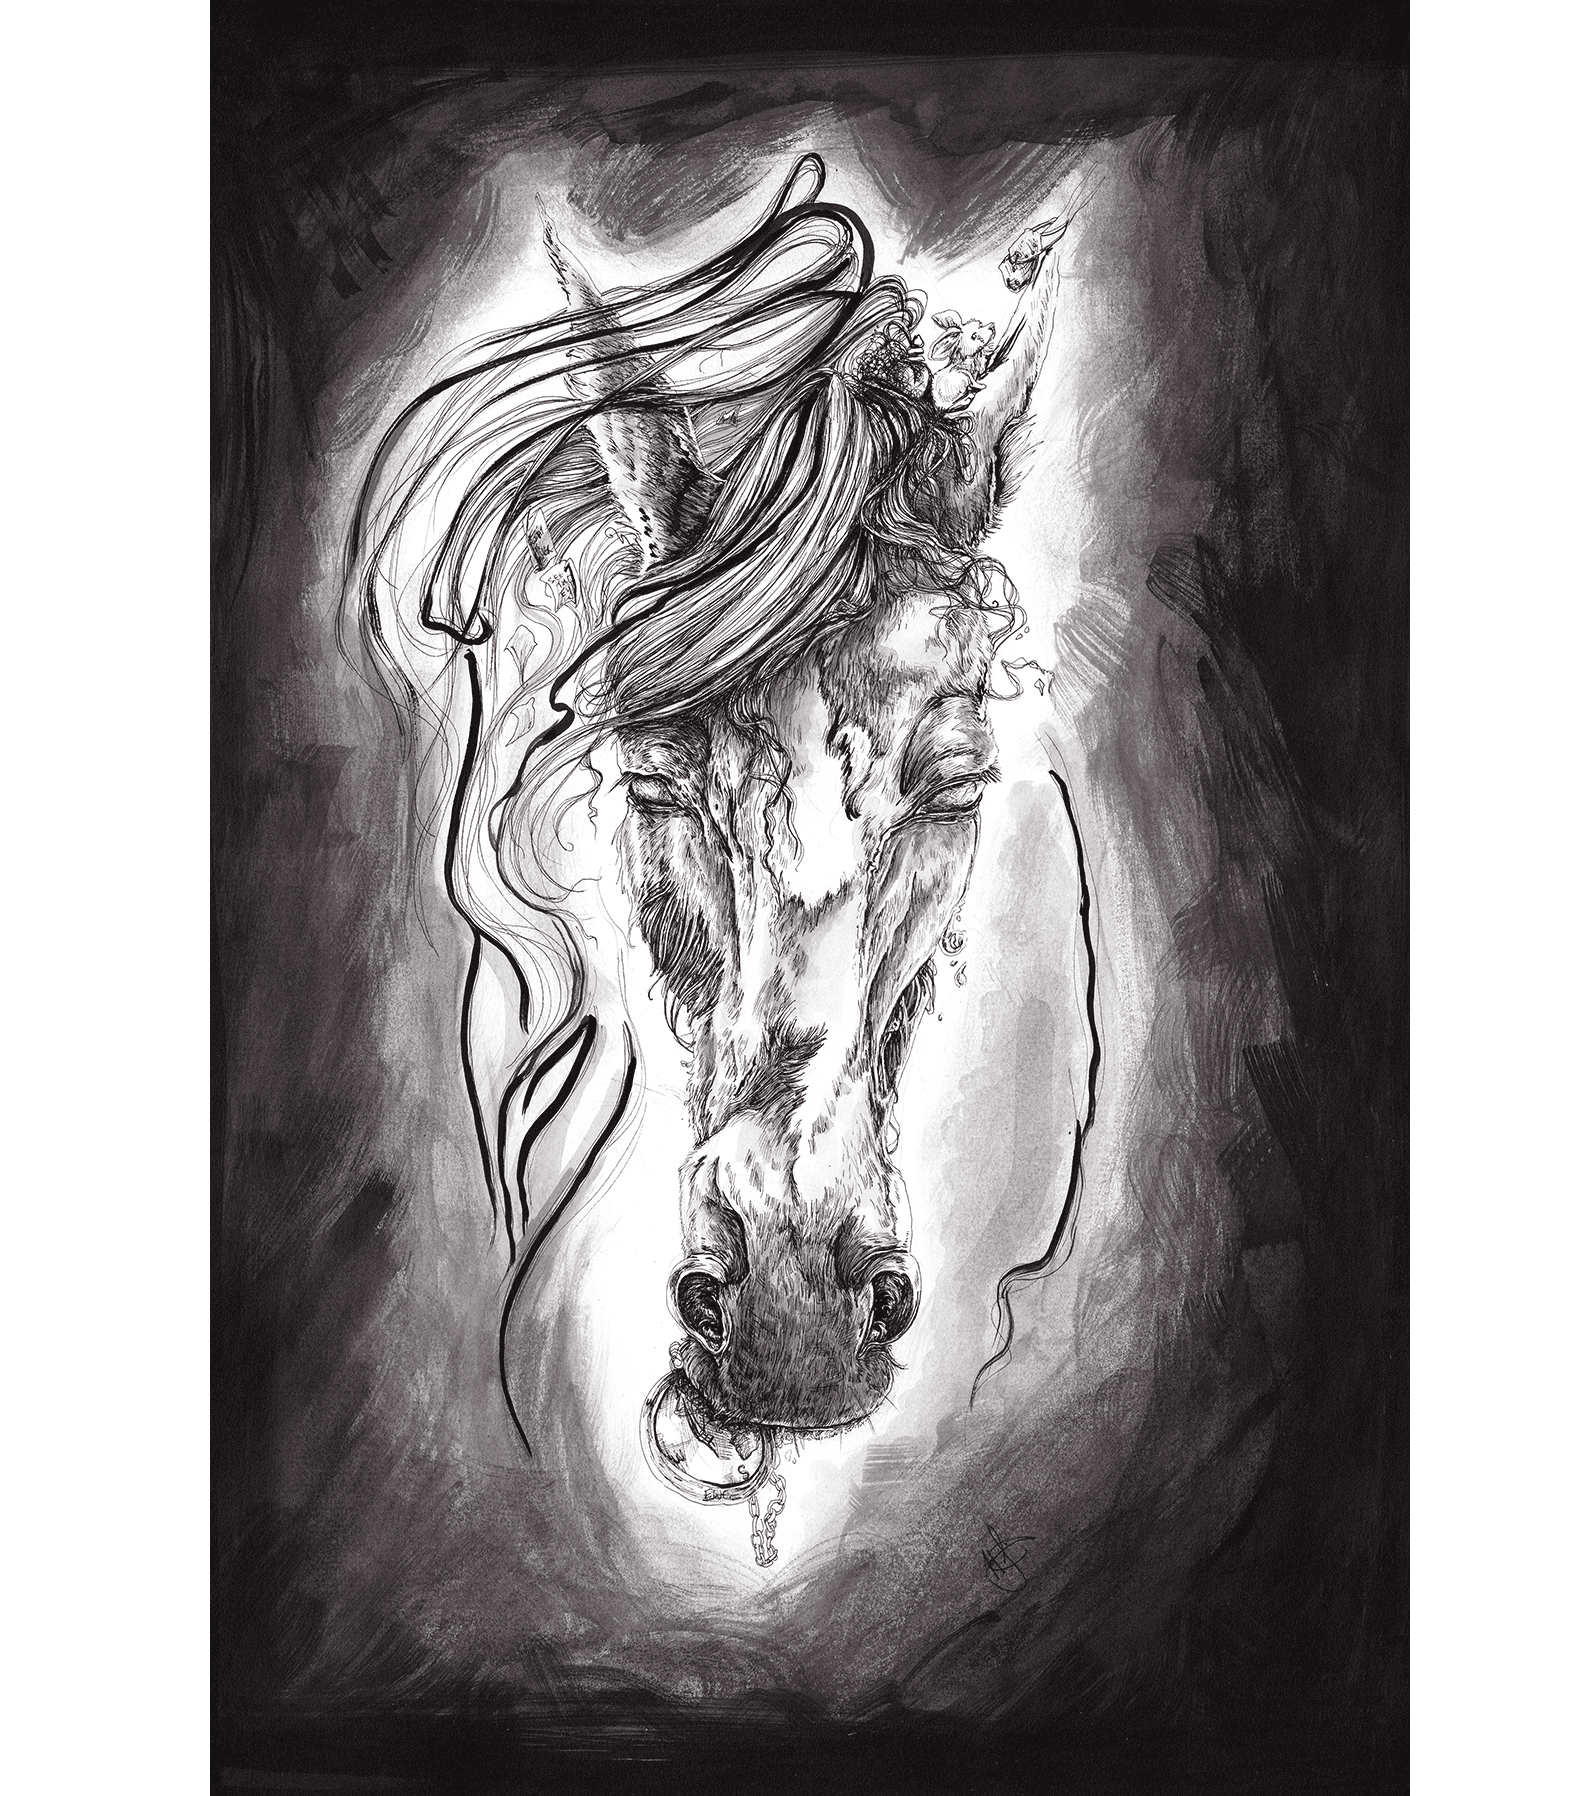 Helena_Grimes_origi-drawing_not_ewe.png